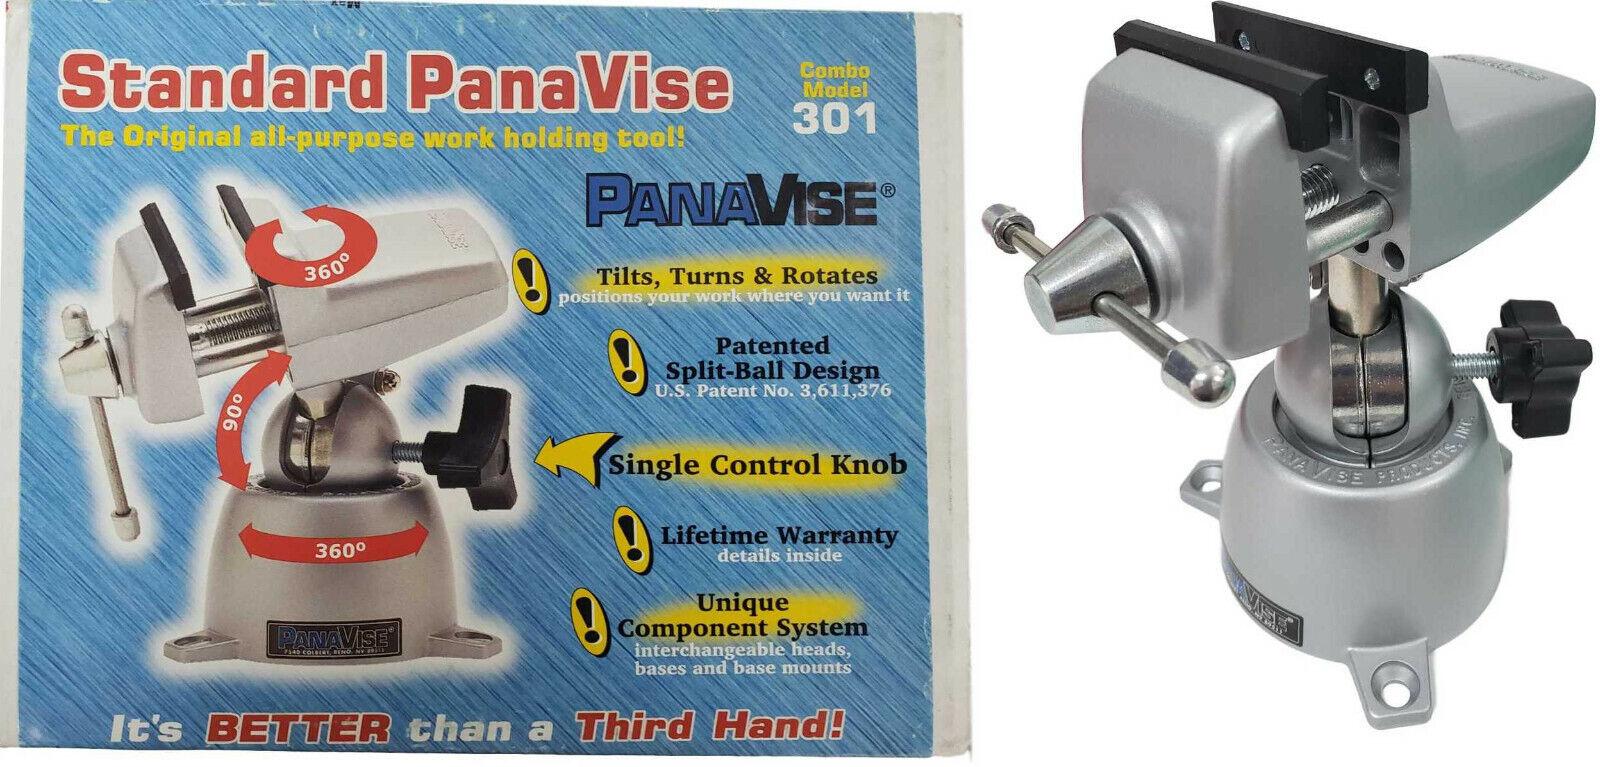 PanaVise 301 Standard PanaVise Pack 2-